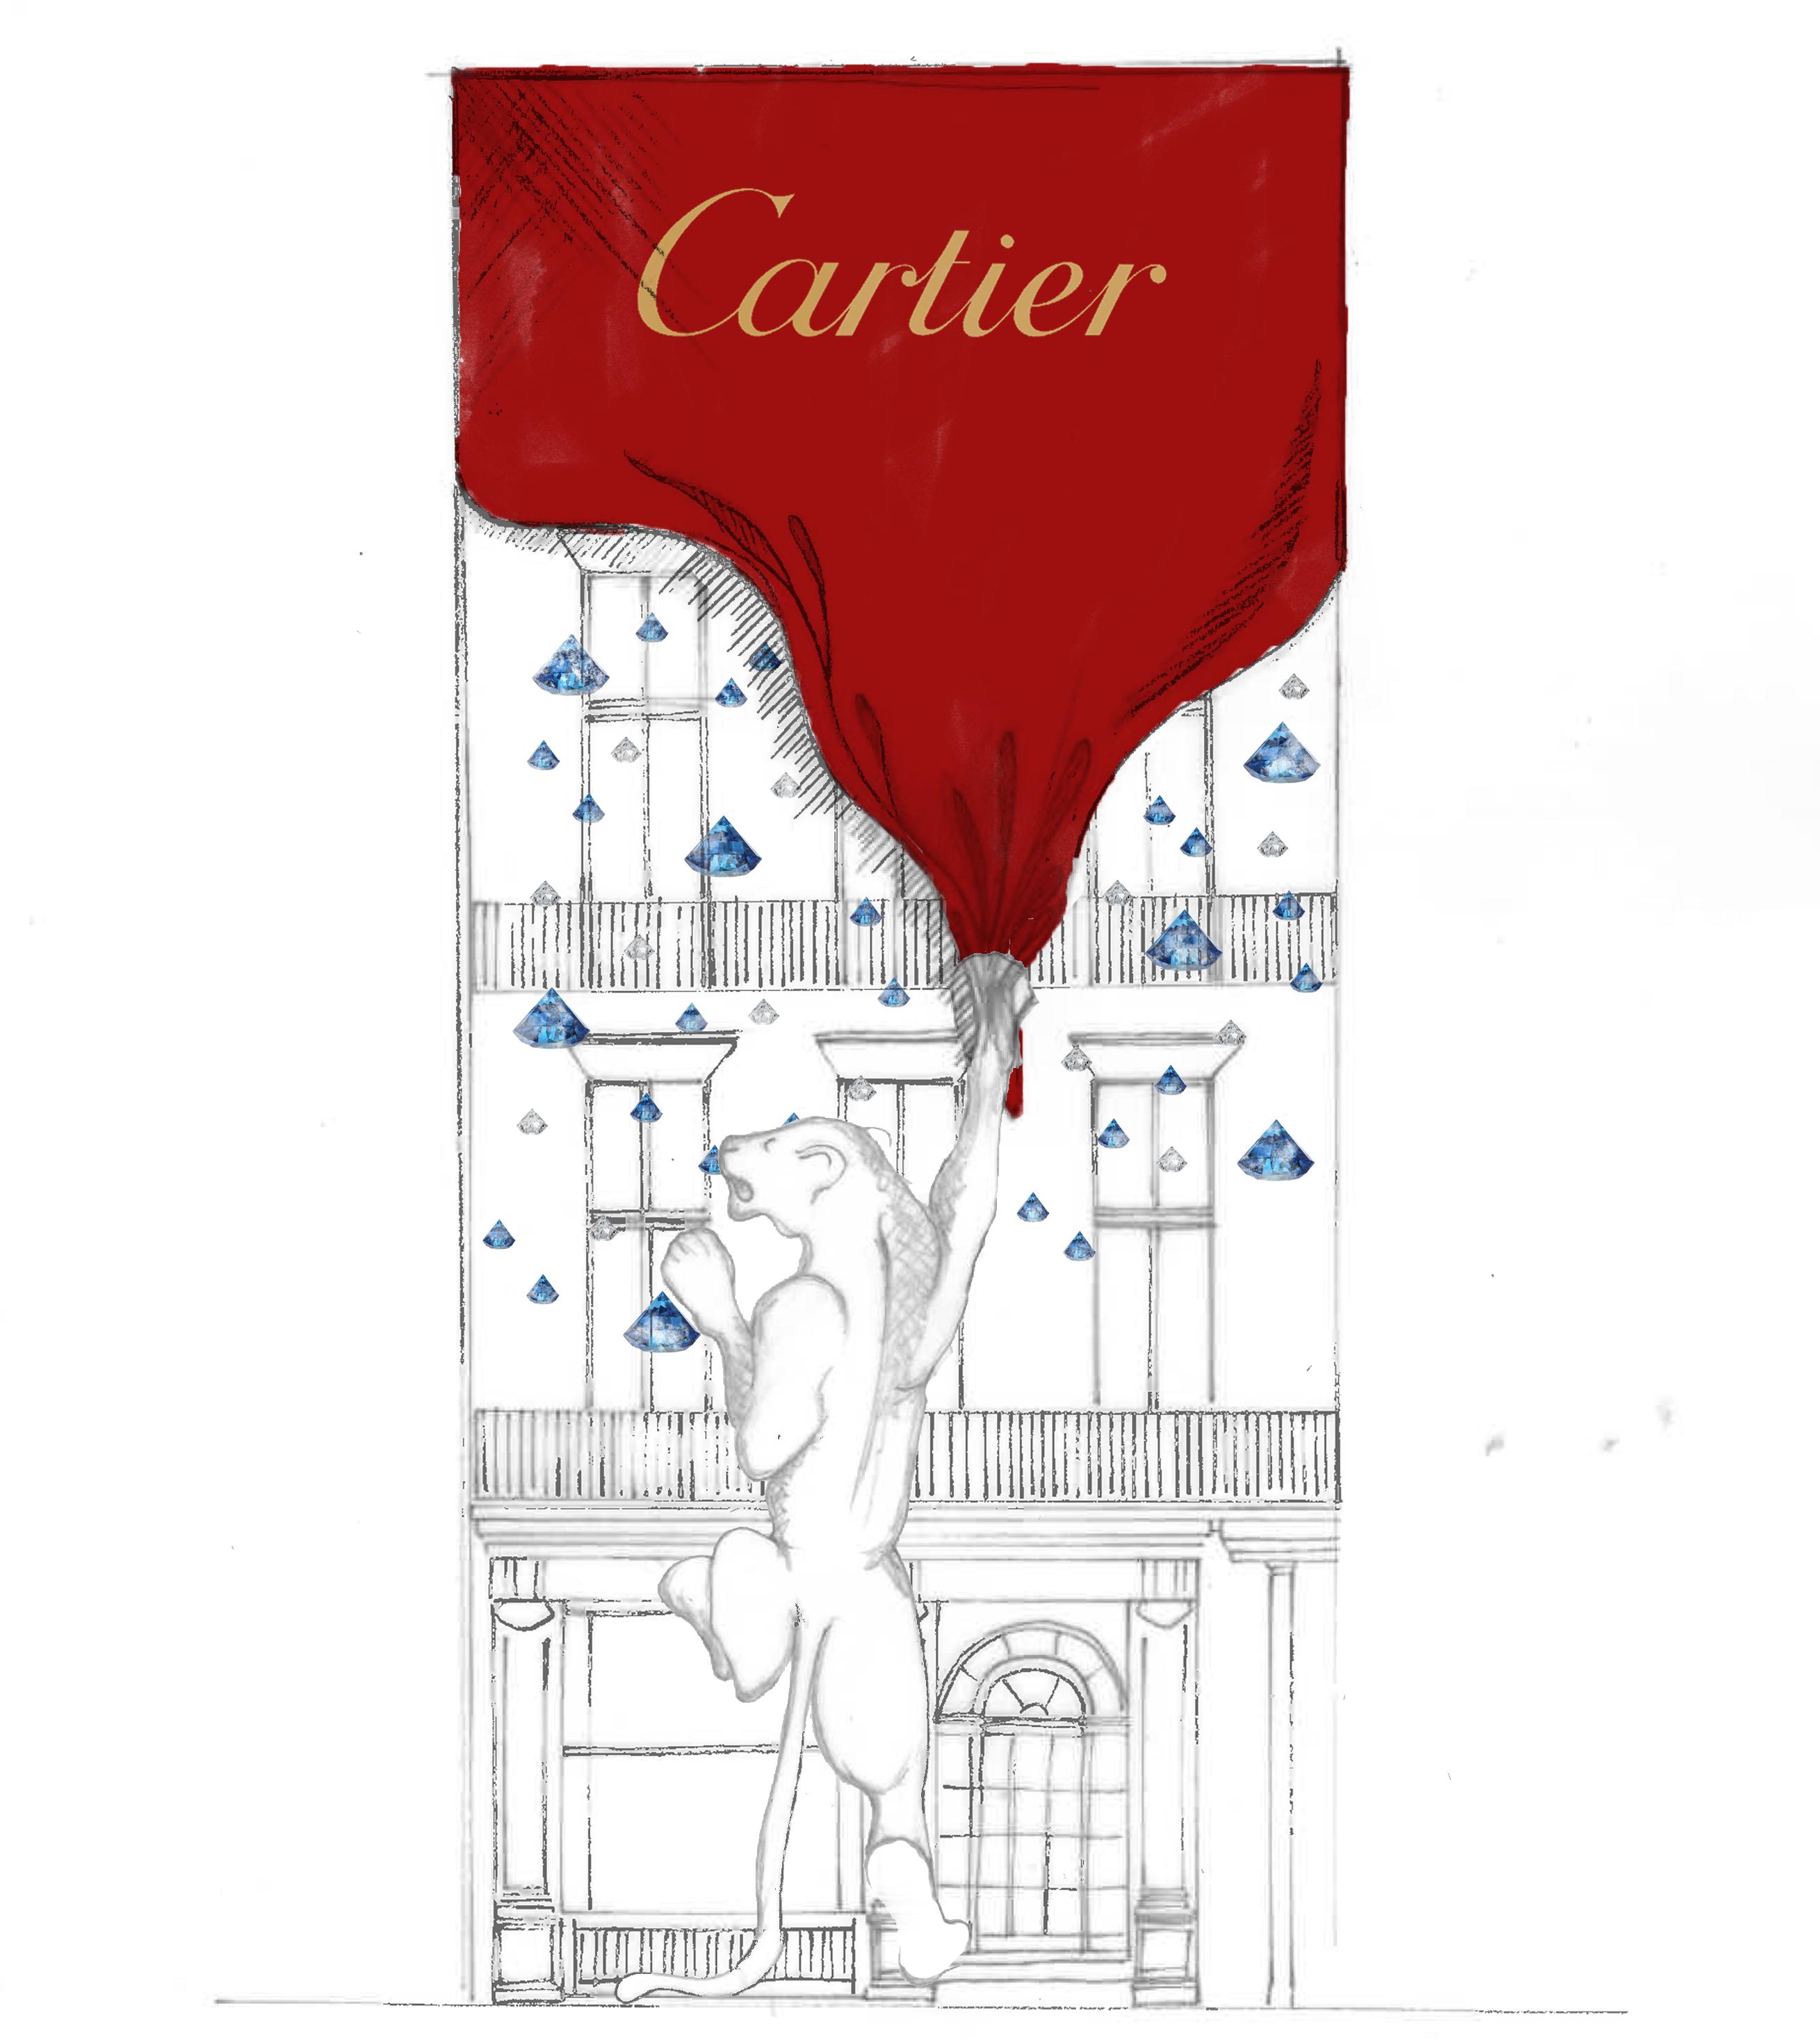 Cartier store front concept 1 NBS